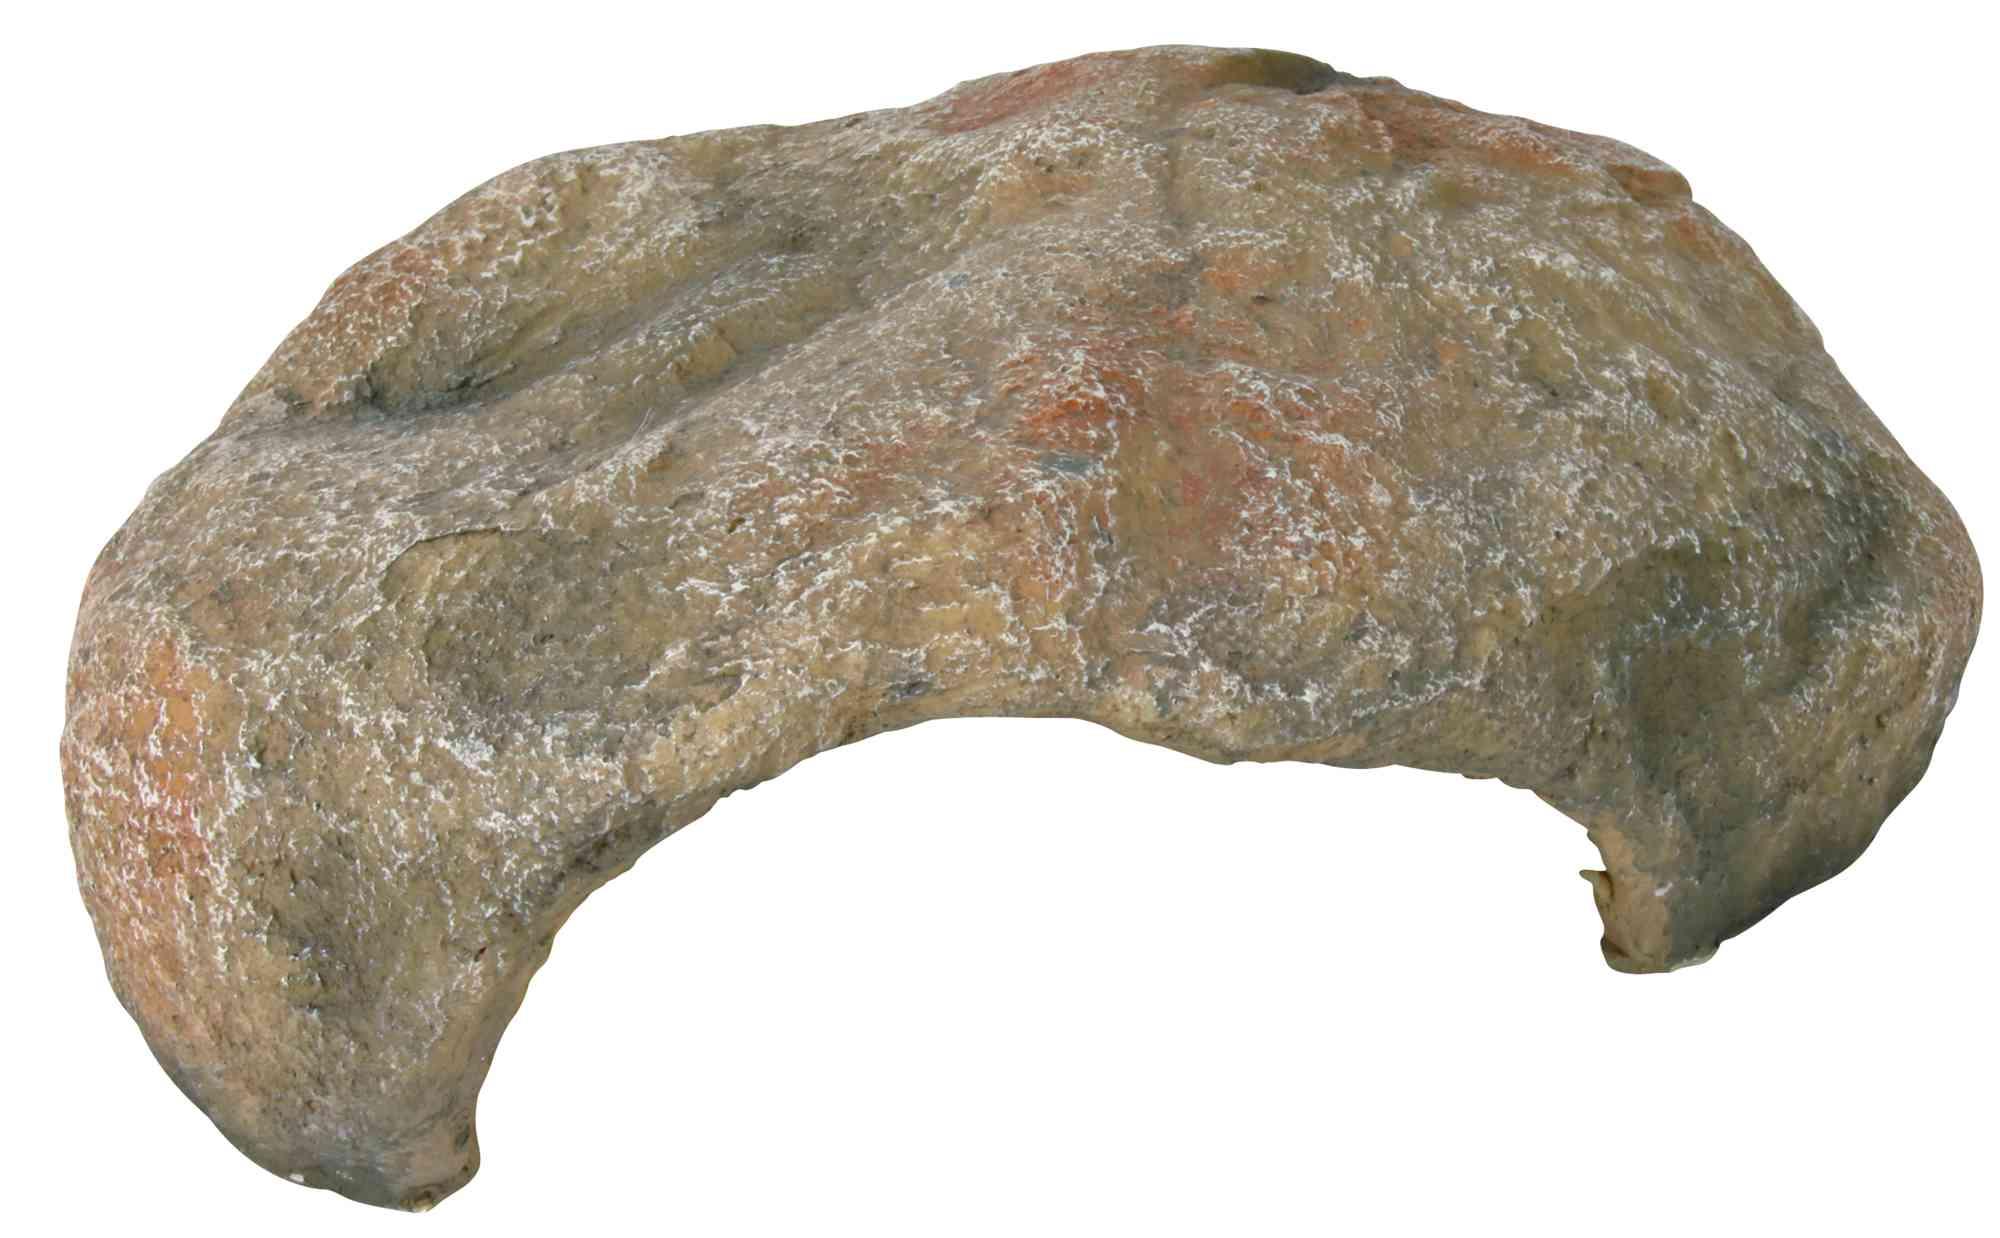 TRIXIE Reptilienhöhle TRIXIE Reptilienhöhle, 27 × 10 × 22 cm